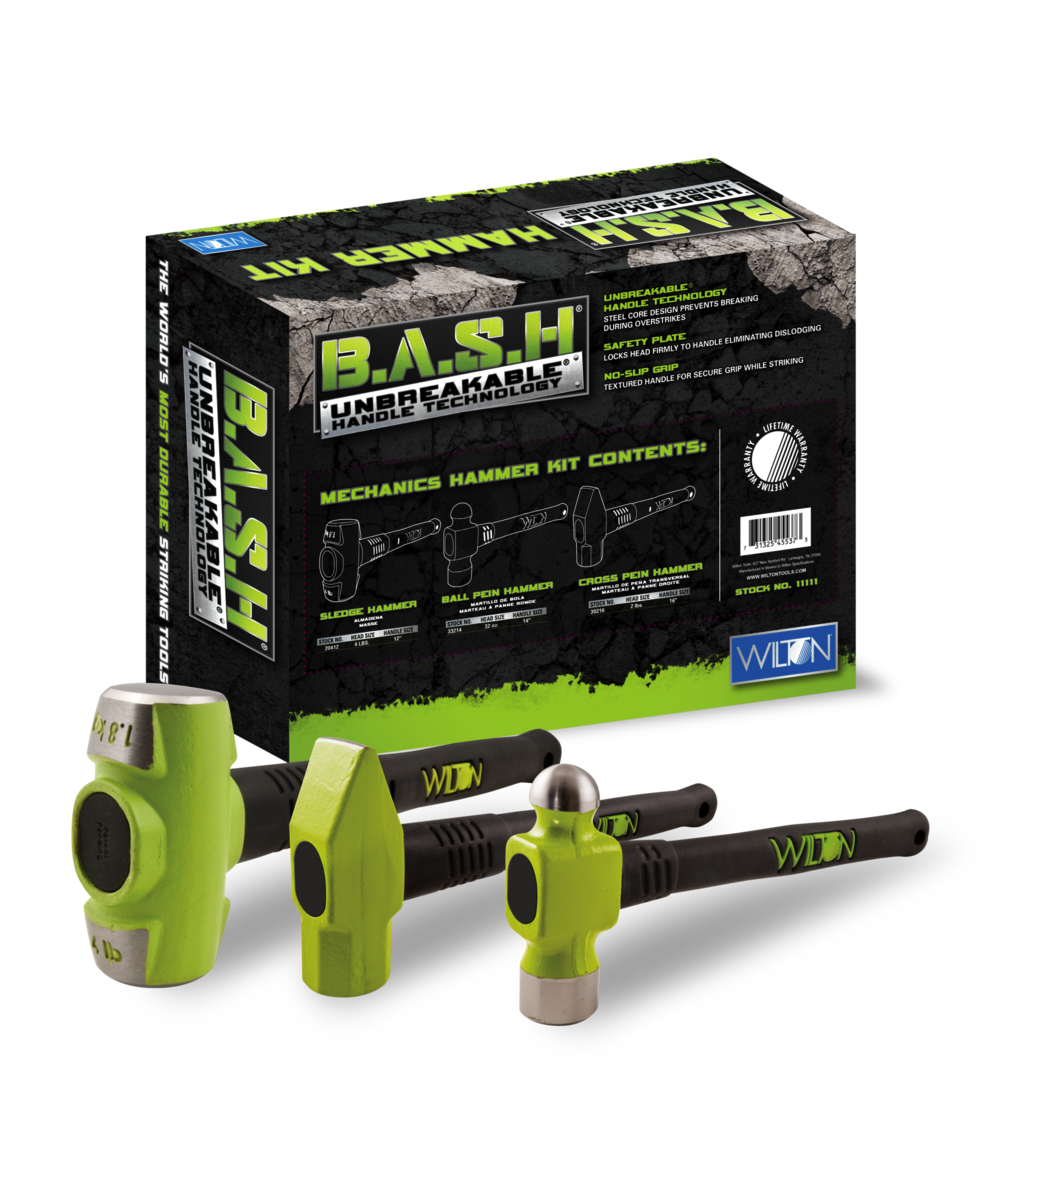 B.A.S.H® Mechanics Hammer Kit